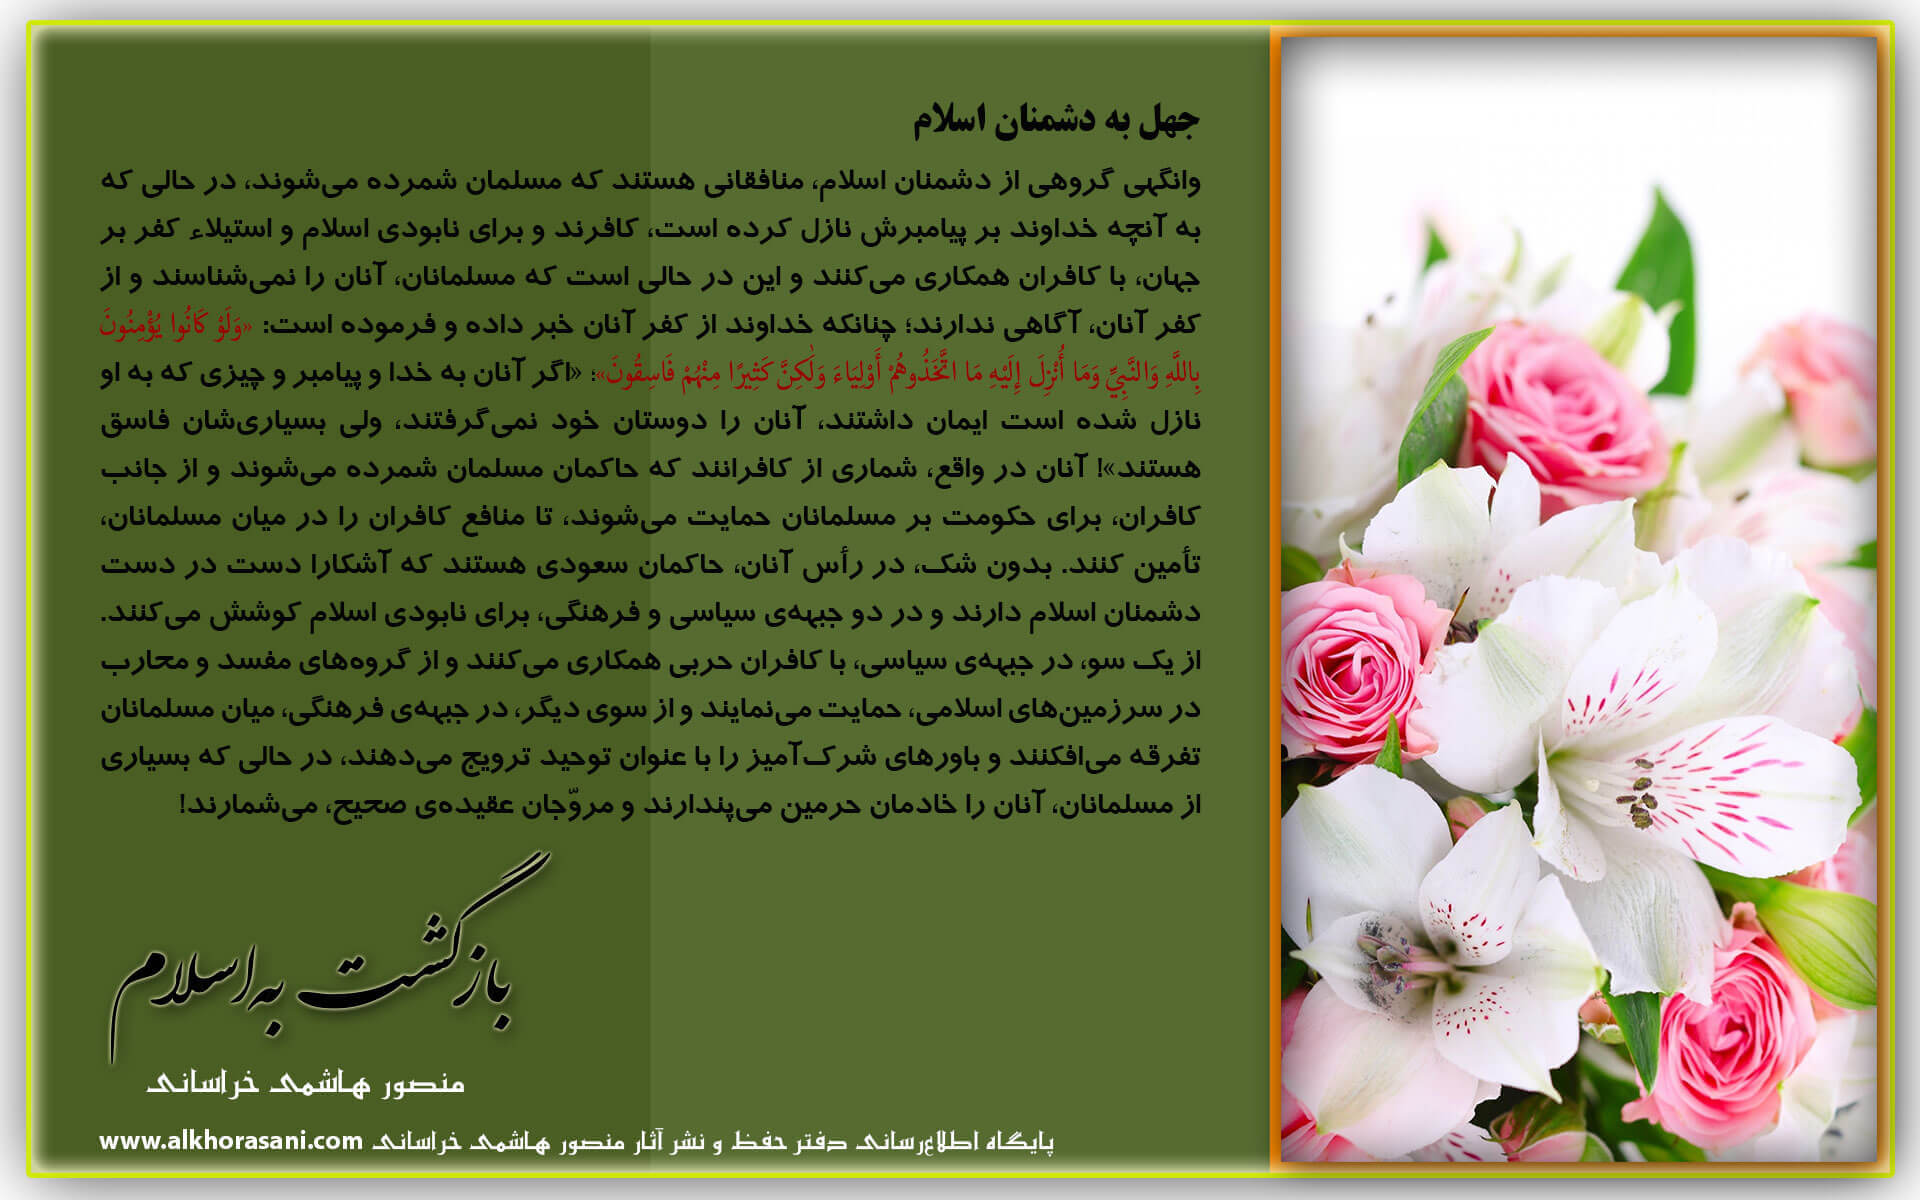 جهل به دشمنان اسلام (2)